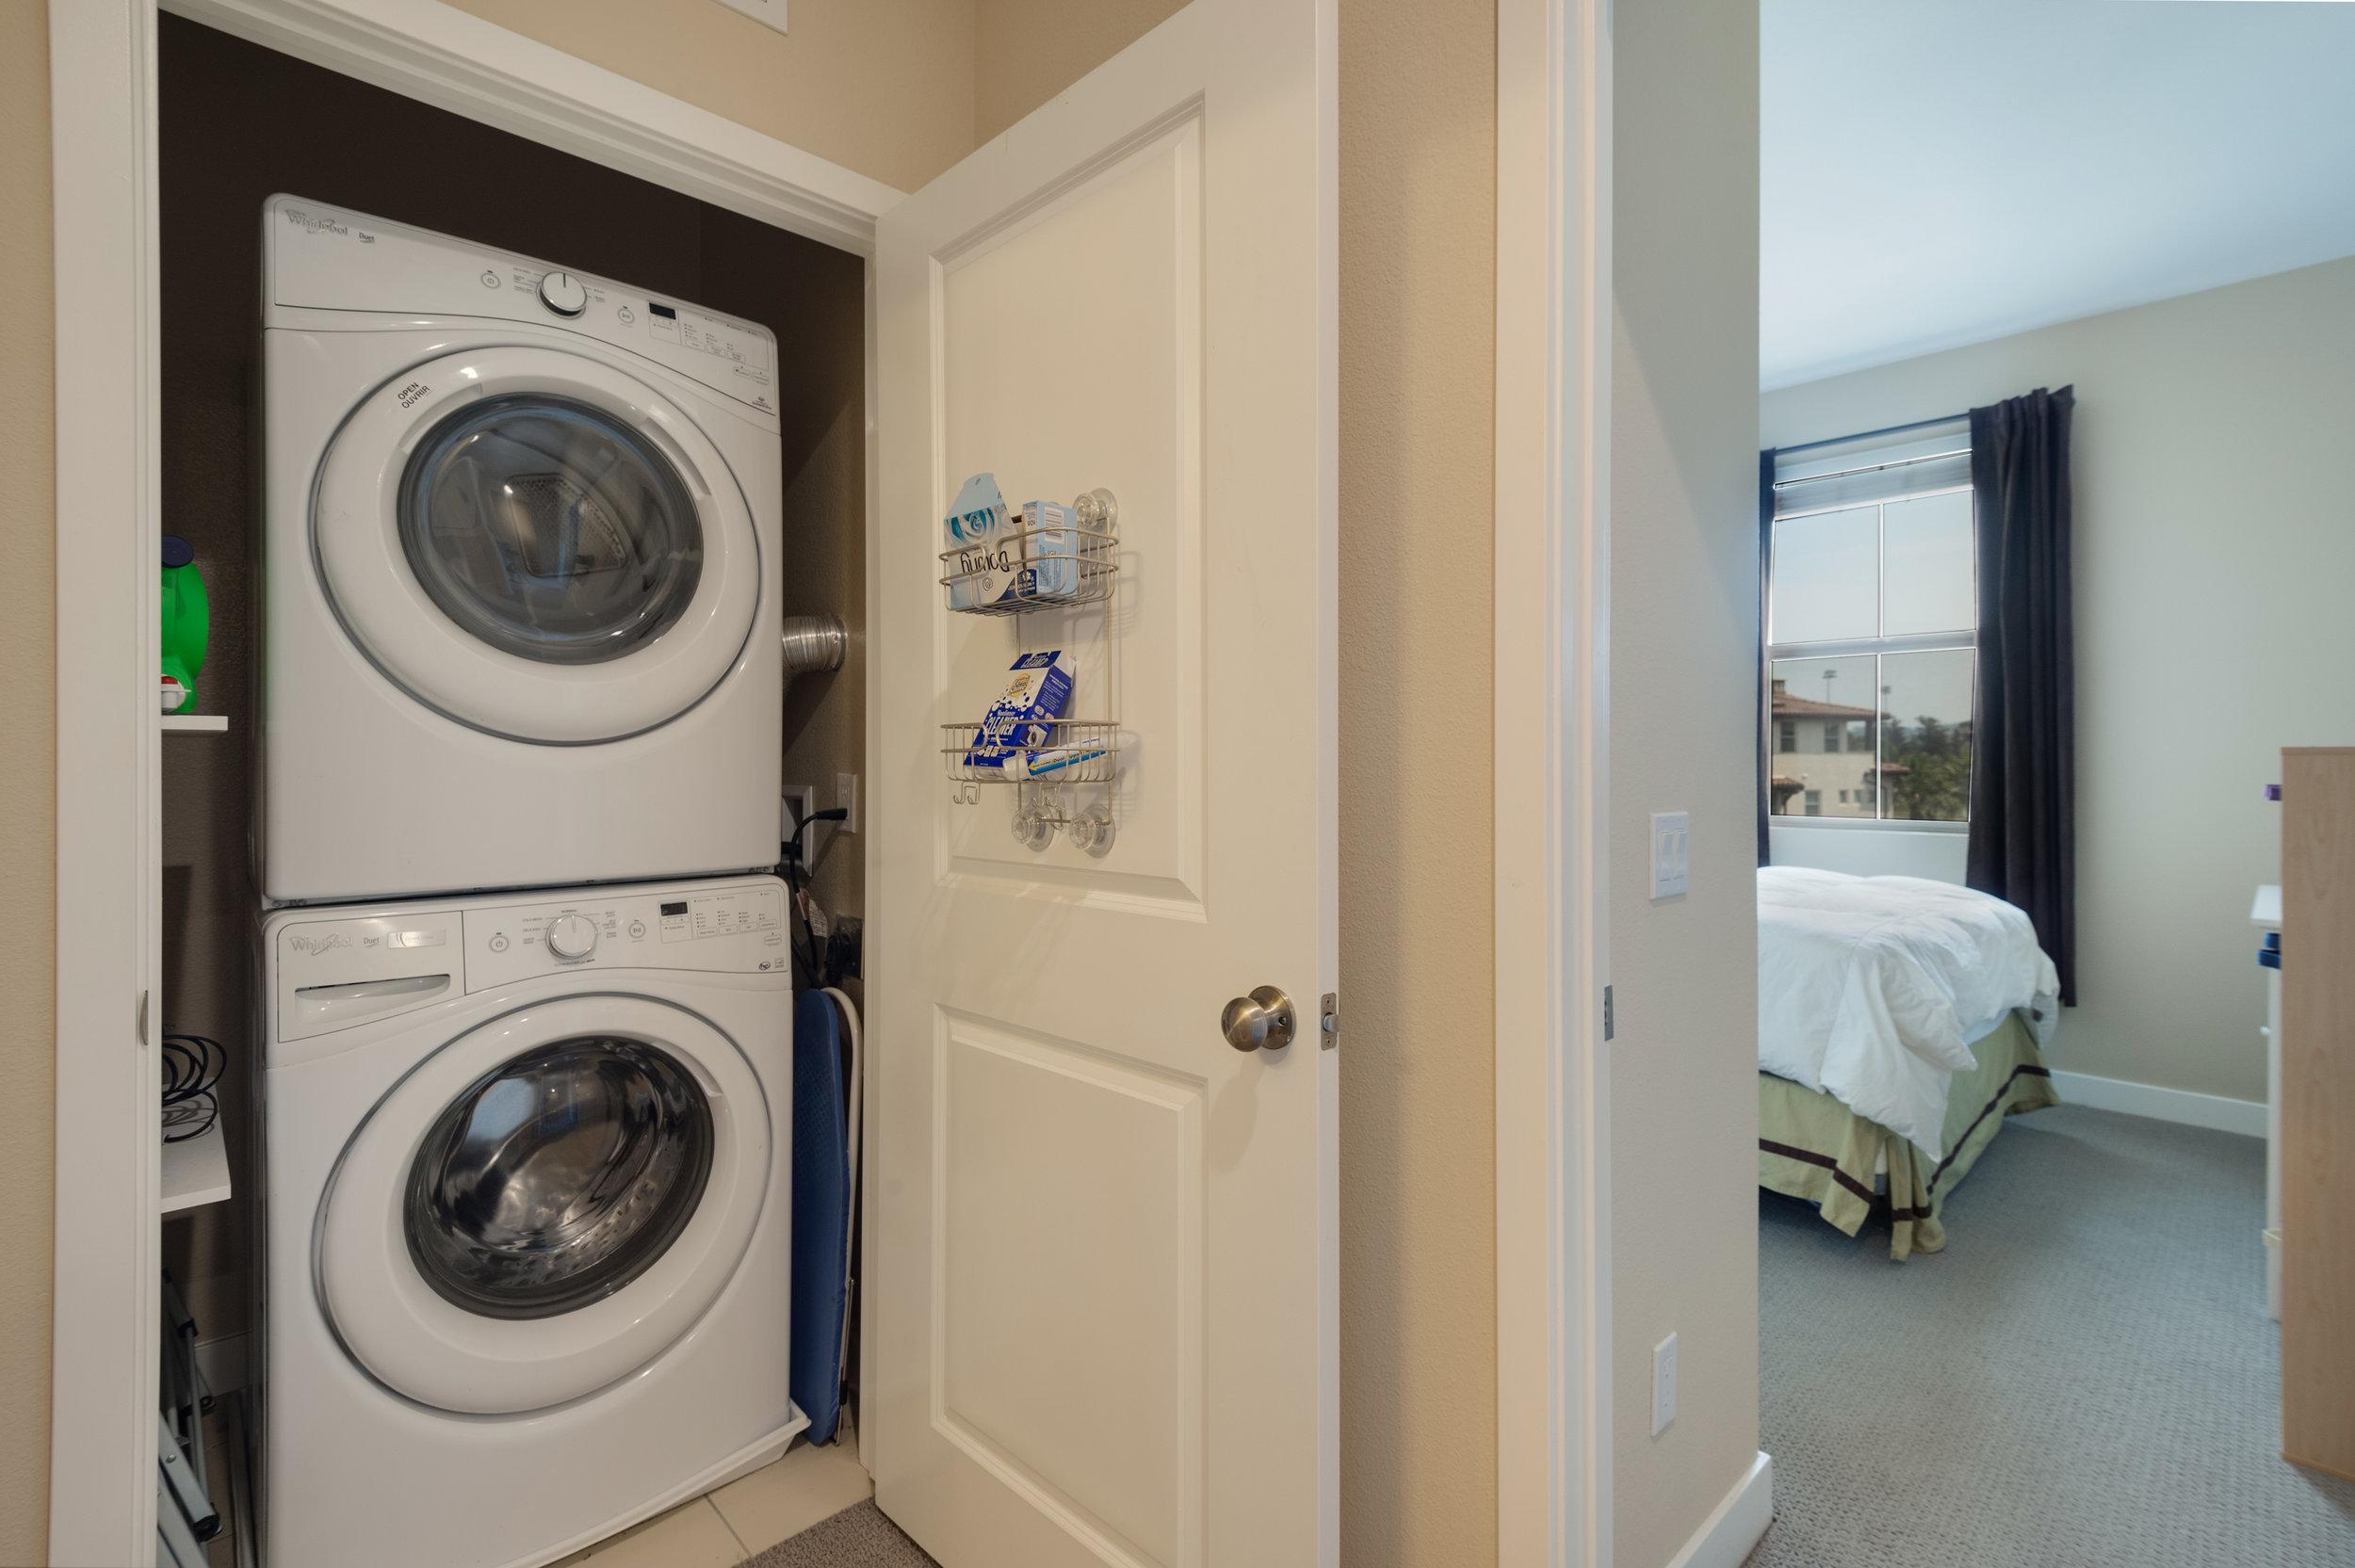 017 Laundry 207 Westpark Court Unit 702 Camarillo Bally Khehra For Sale Lease The Malibu Life Team Luxury Real Estate.jpg